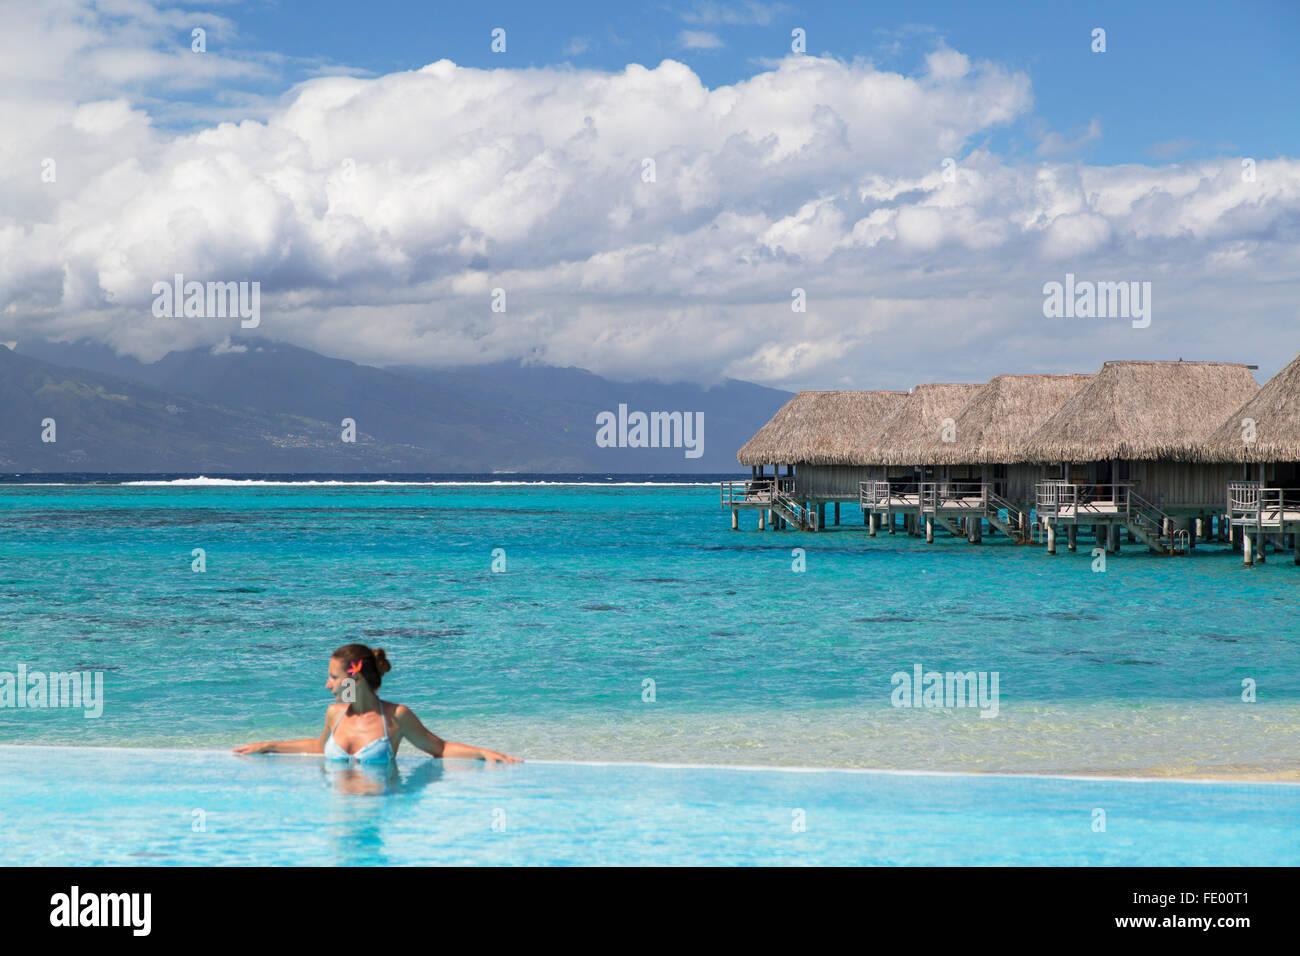 Woman in pool at Sofitel Hotel, Moorea, Society Islands, French Polynesia - Stock Image